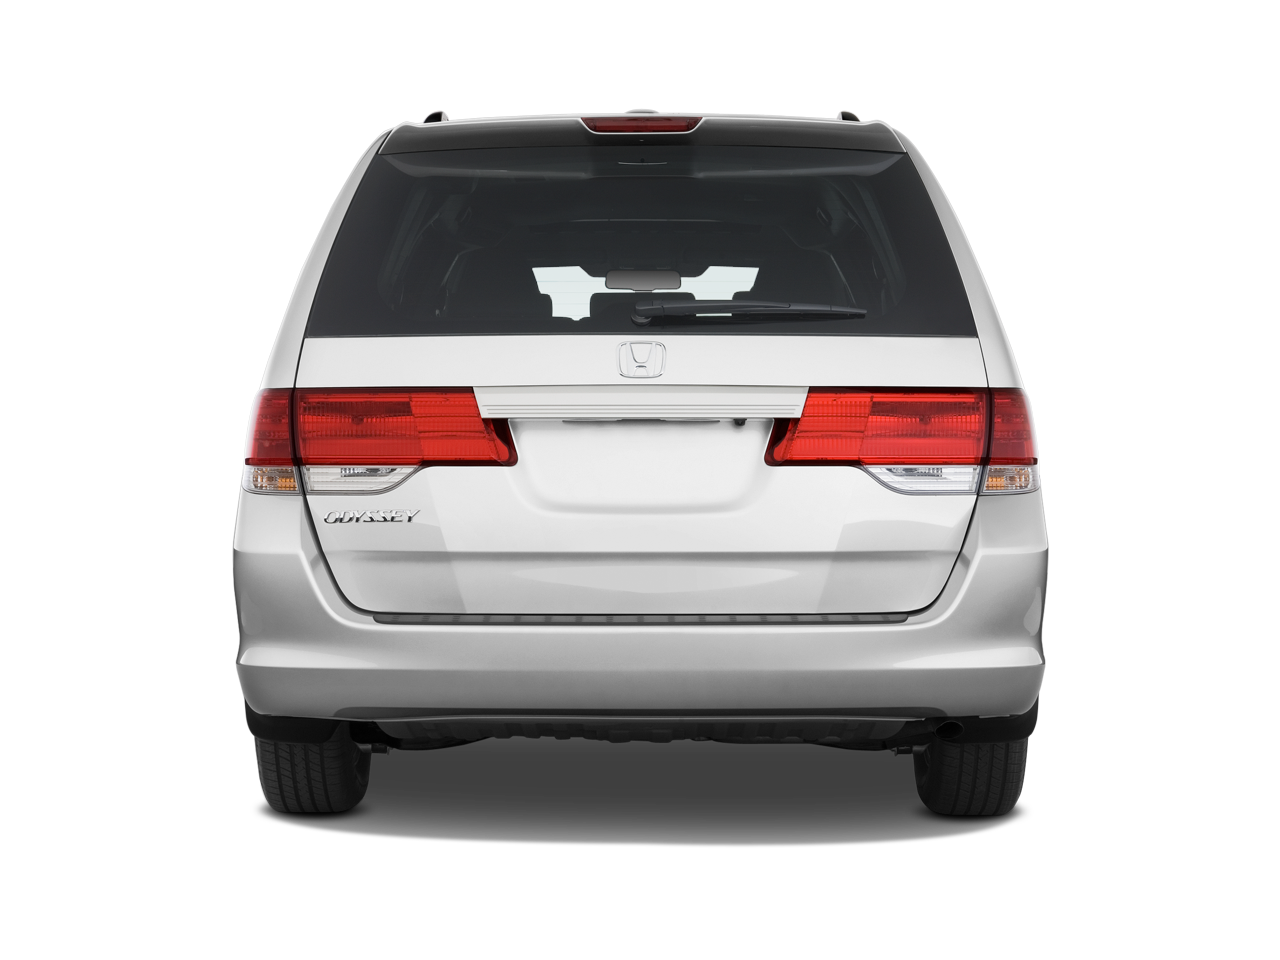 2009 Honda Odyssey Touring Honda Minivan Review